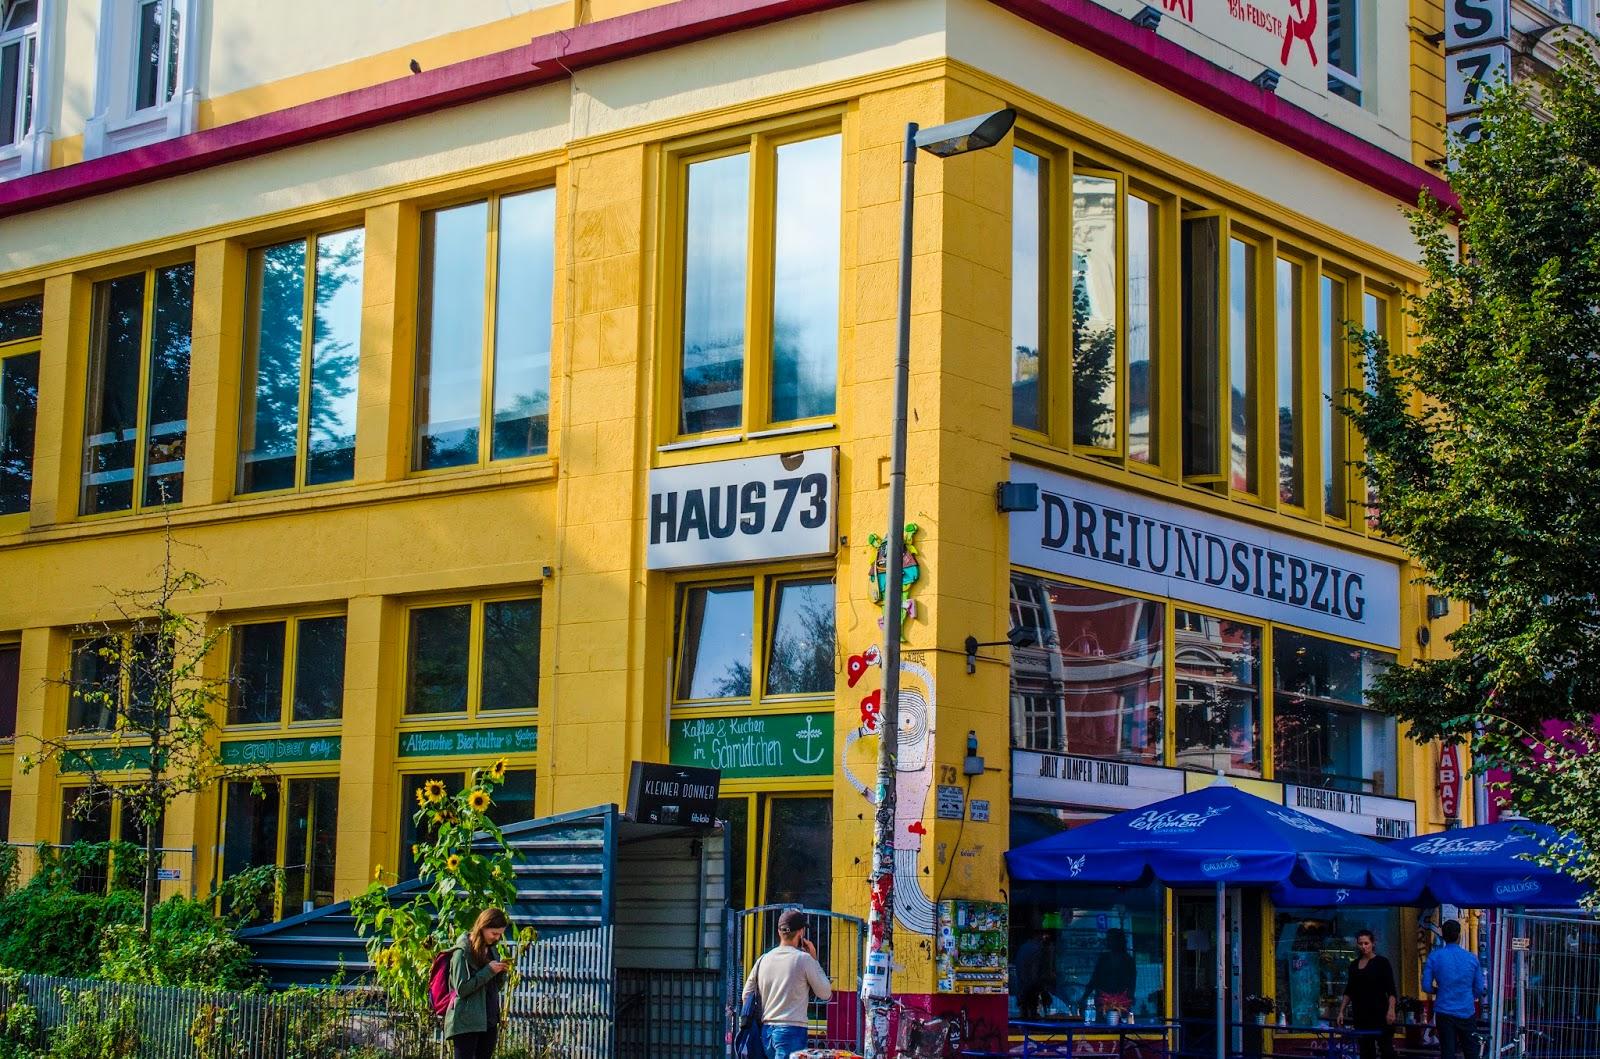 hamburg buildings